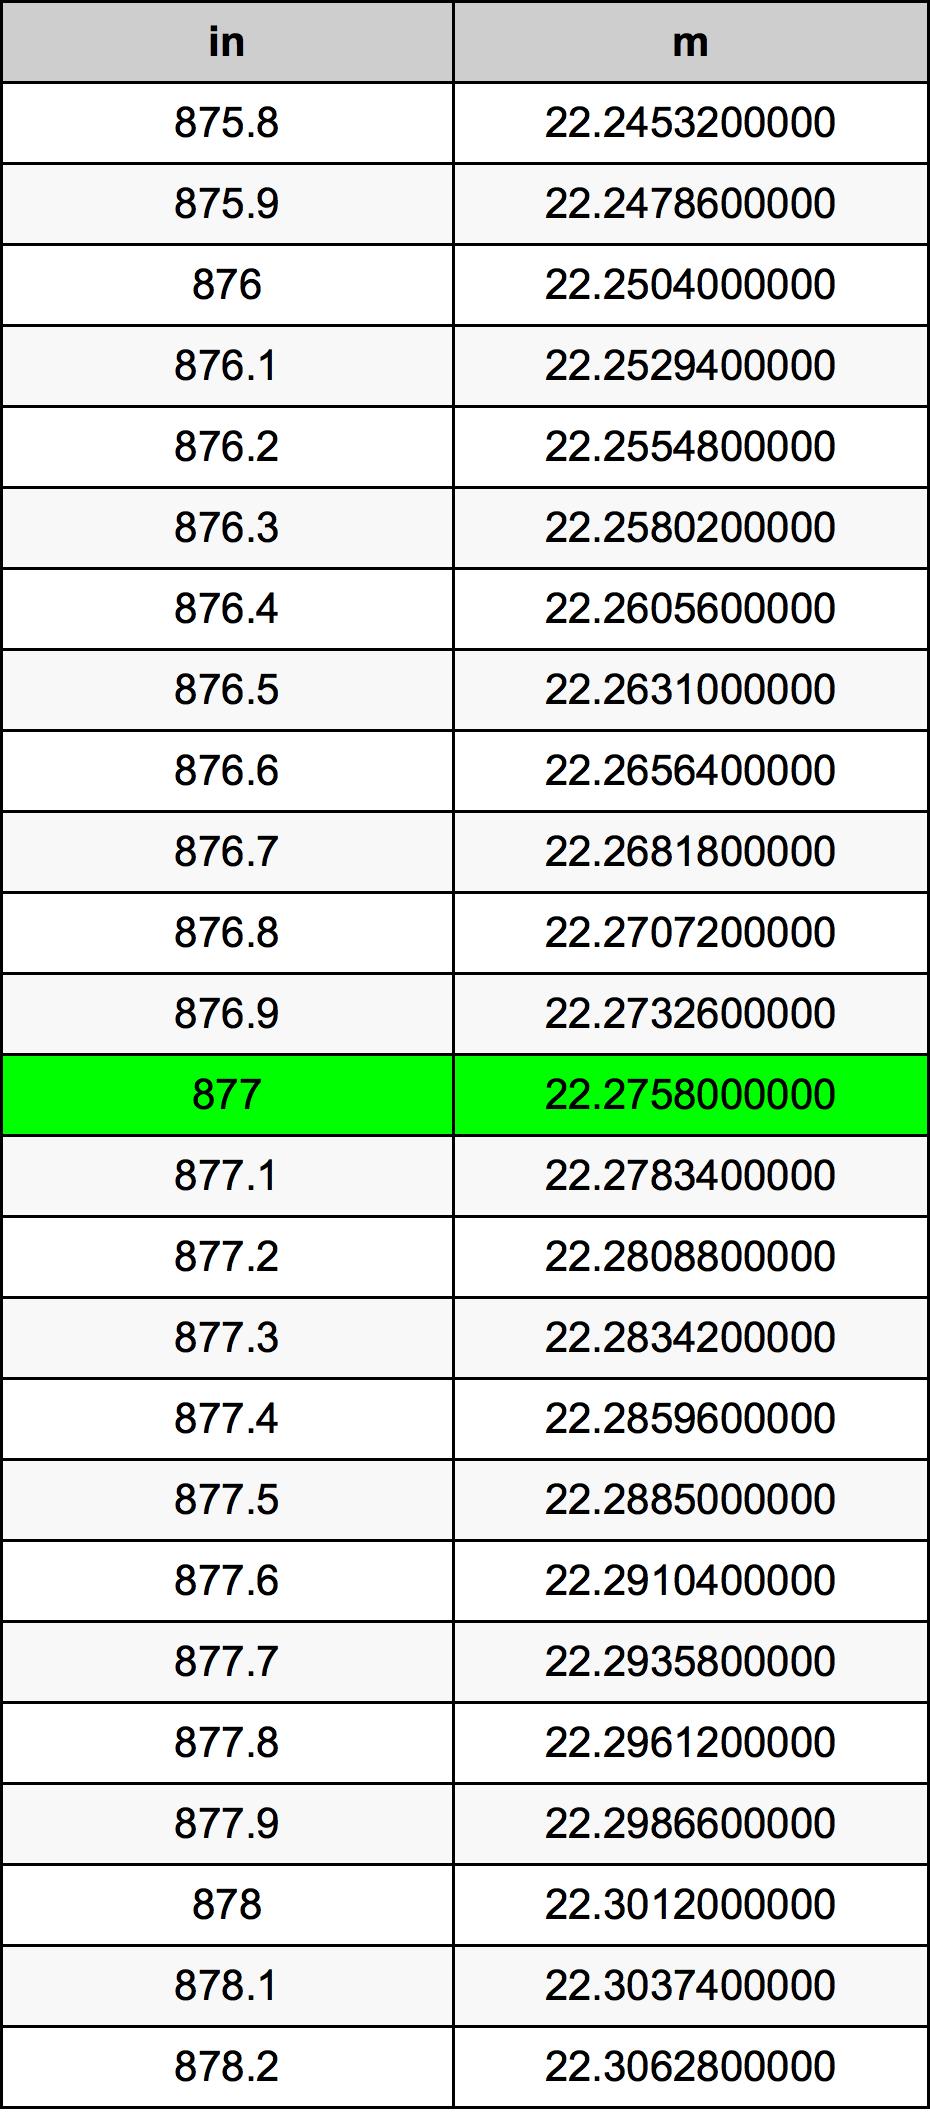 877 इंच रूपांतरण सारणी